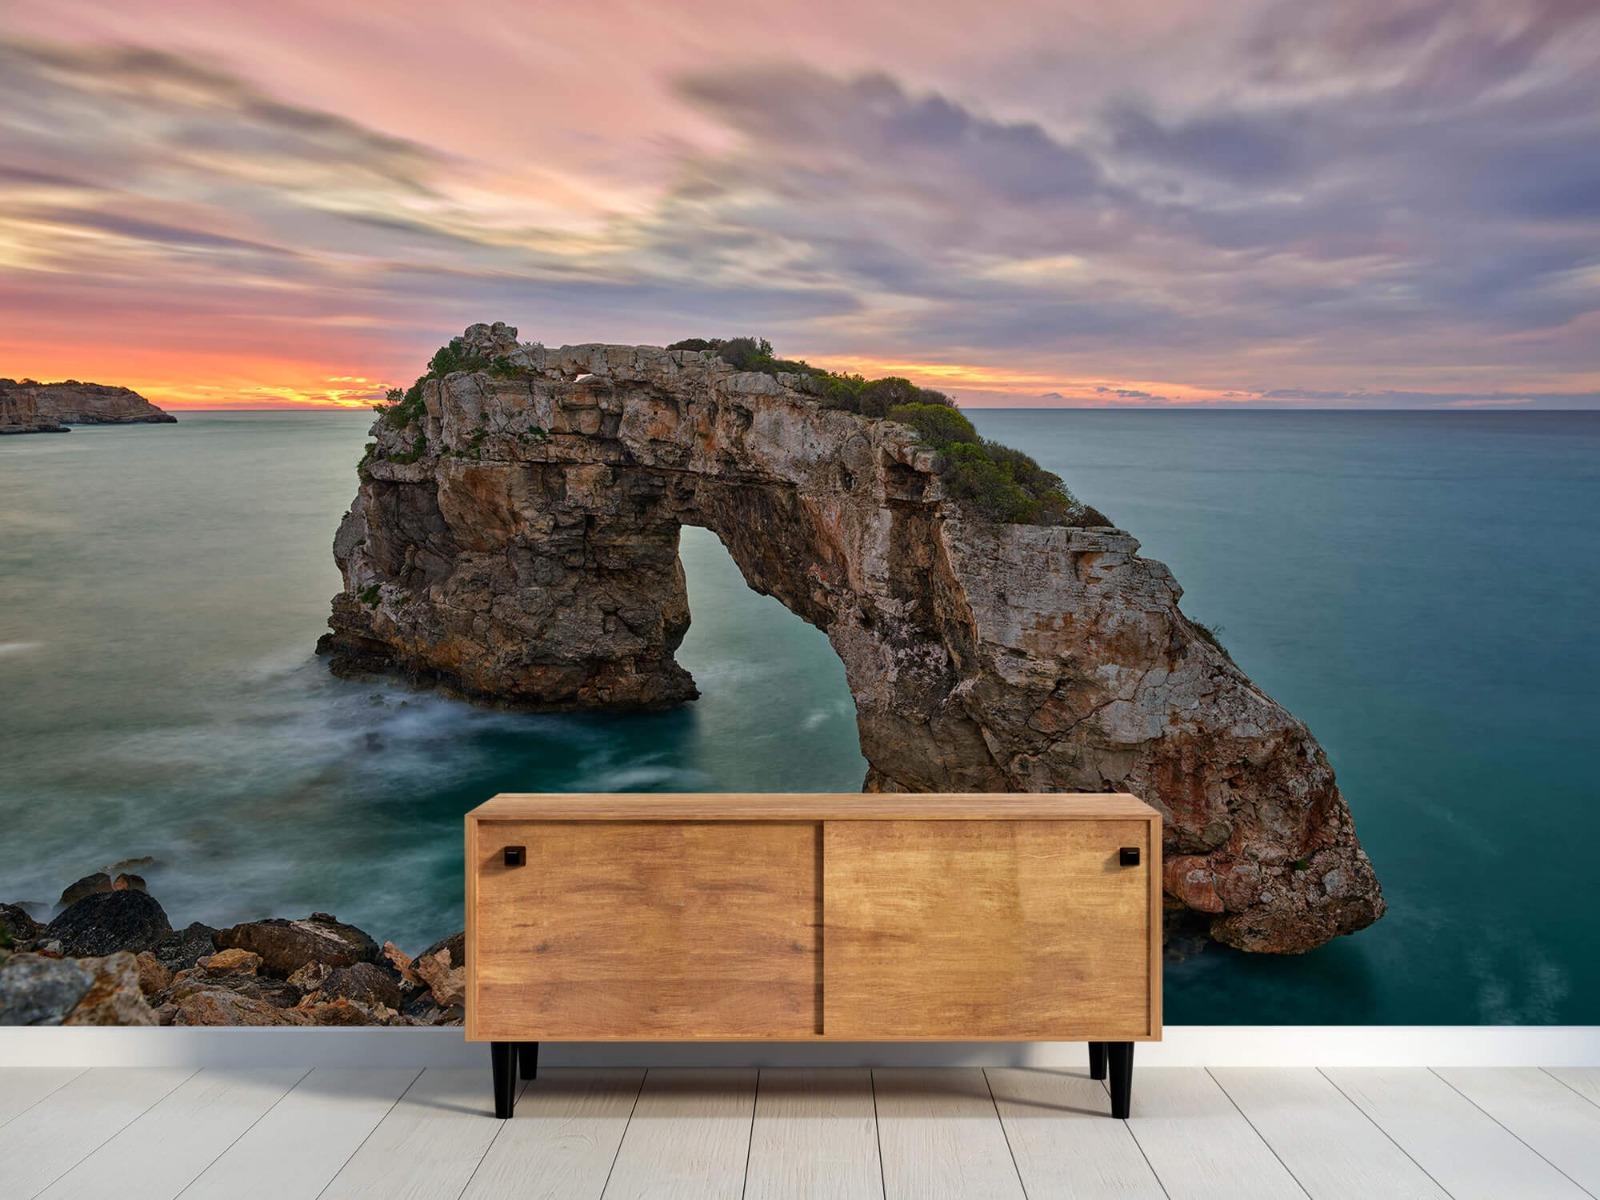 Zeeën en Oceanen - Rots in zee - Slaapkamer 9